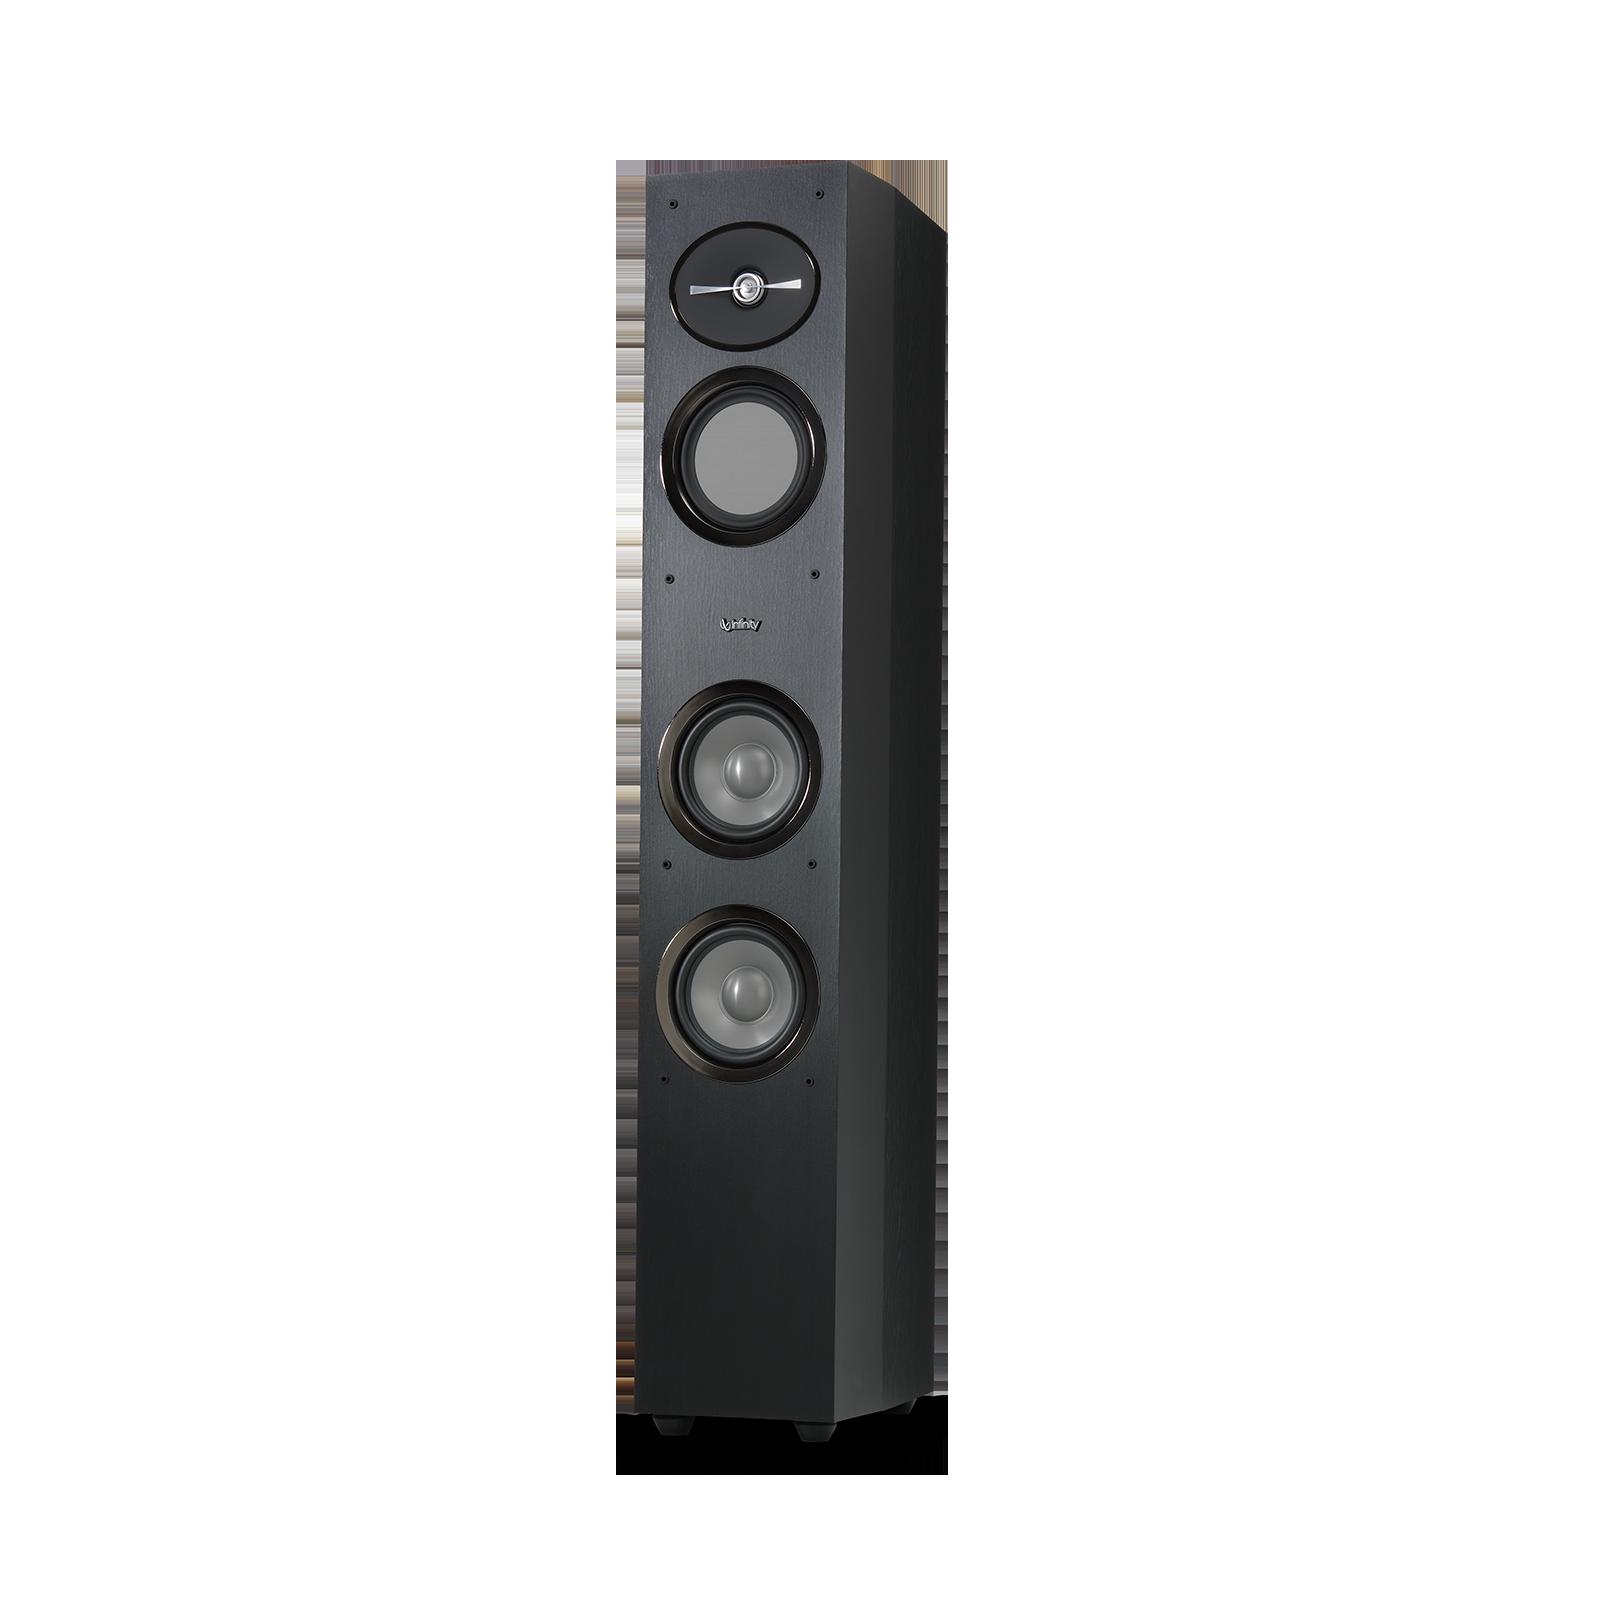 "Reference 253 - Black - 5-1/4"" 3-Way Floorstanding Loudspeaker - Detailshot 1"